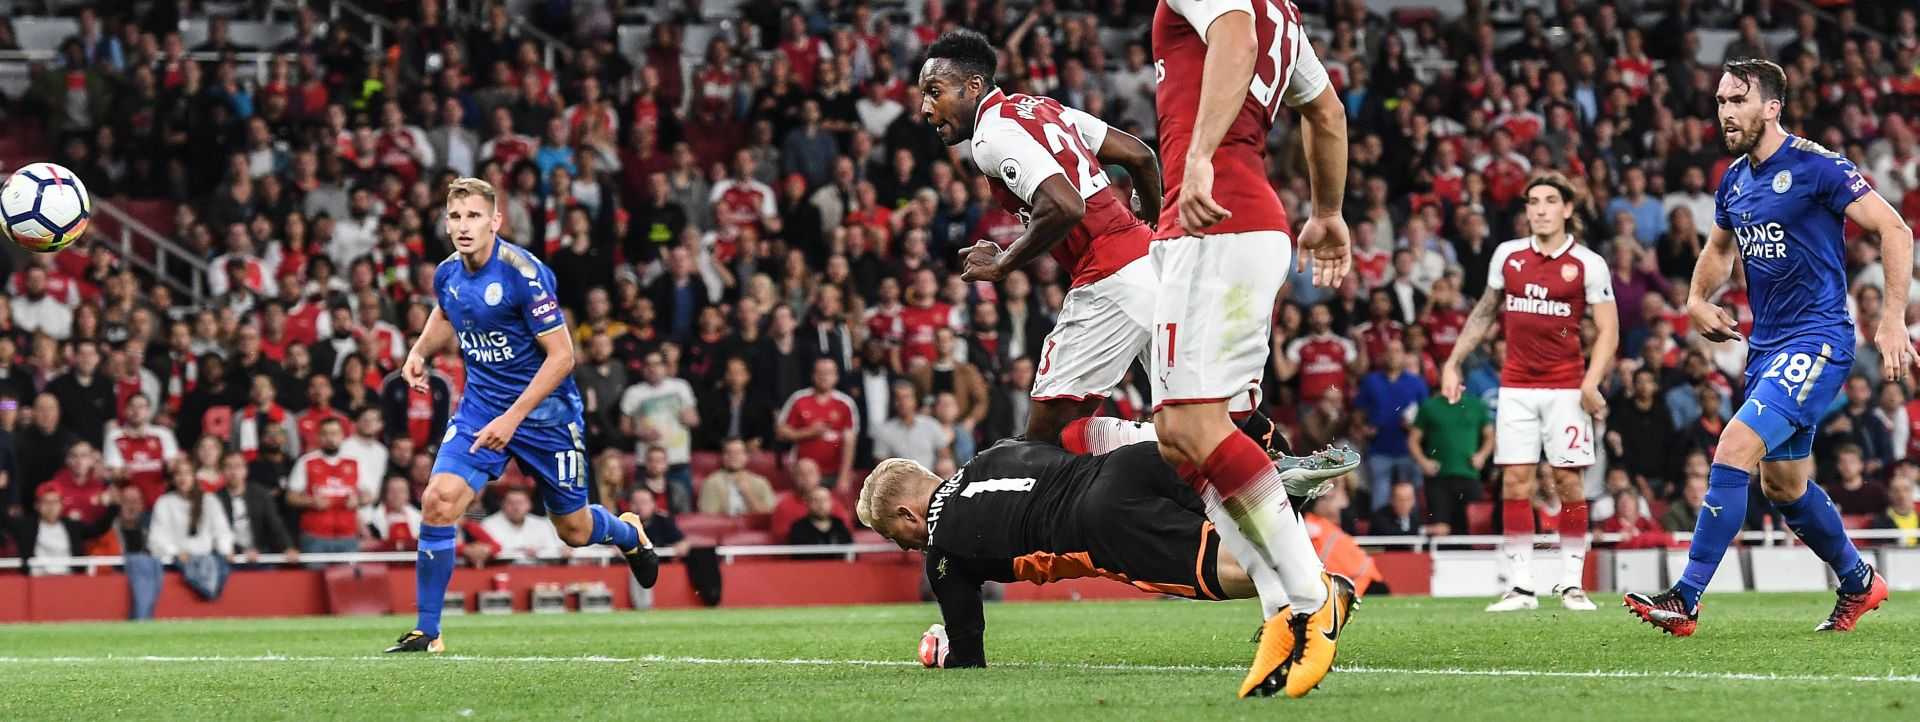 VIDEO: GOLIJADA NA OTVARANJU PREMIER LIGE Arsenal – Leicester 4-3